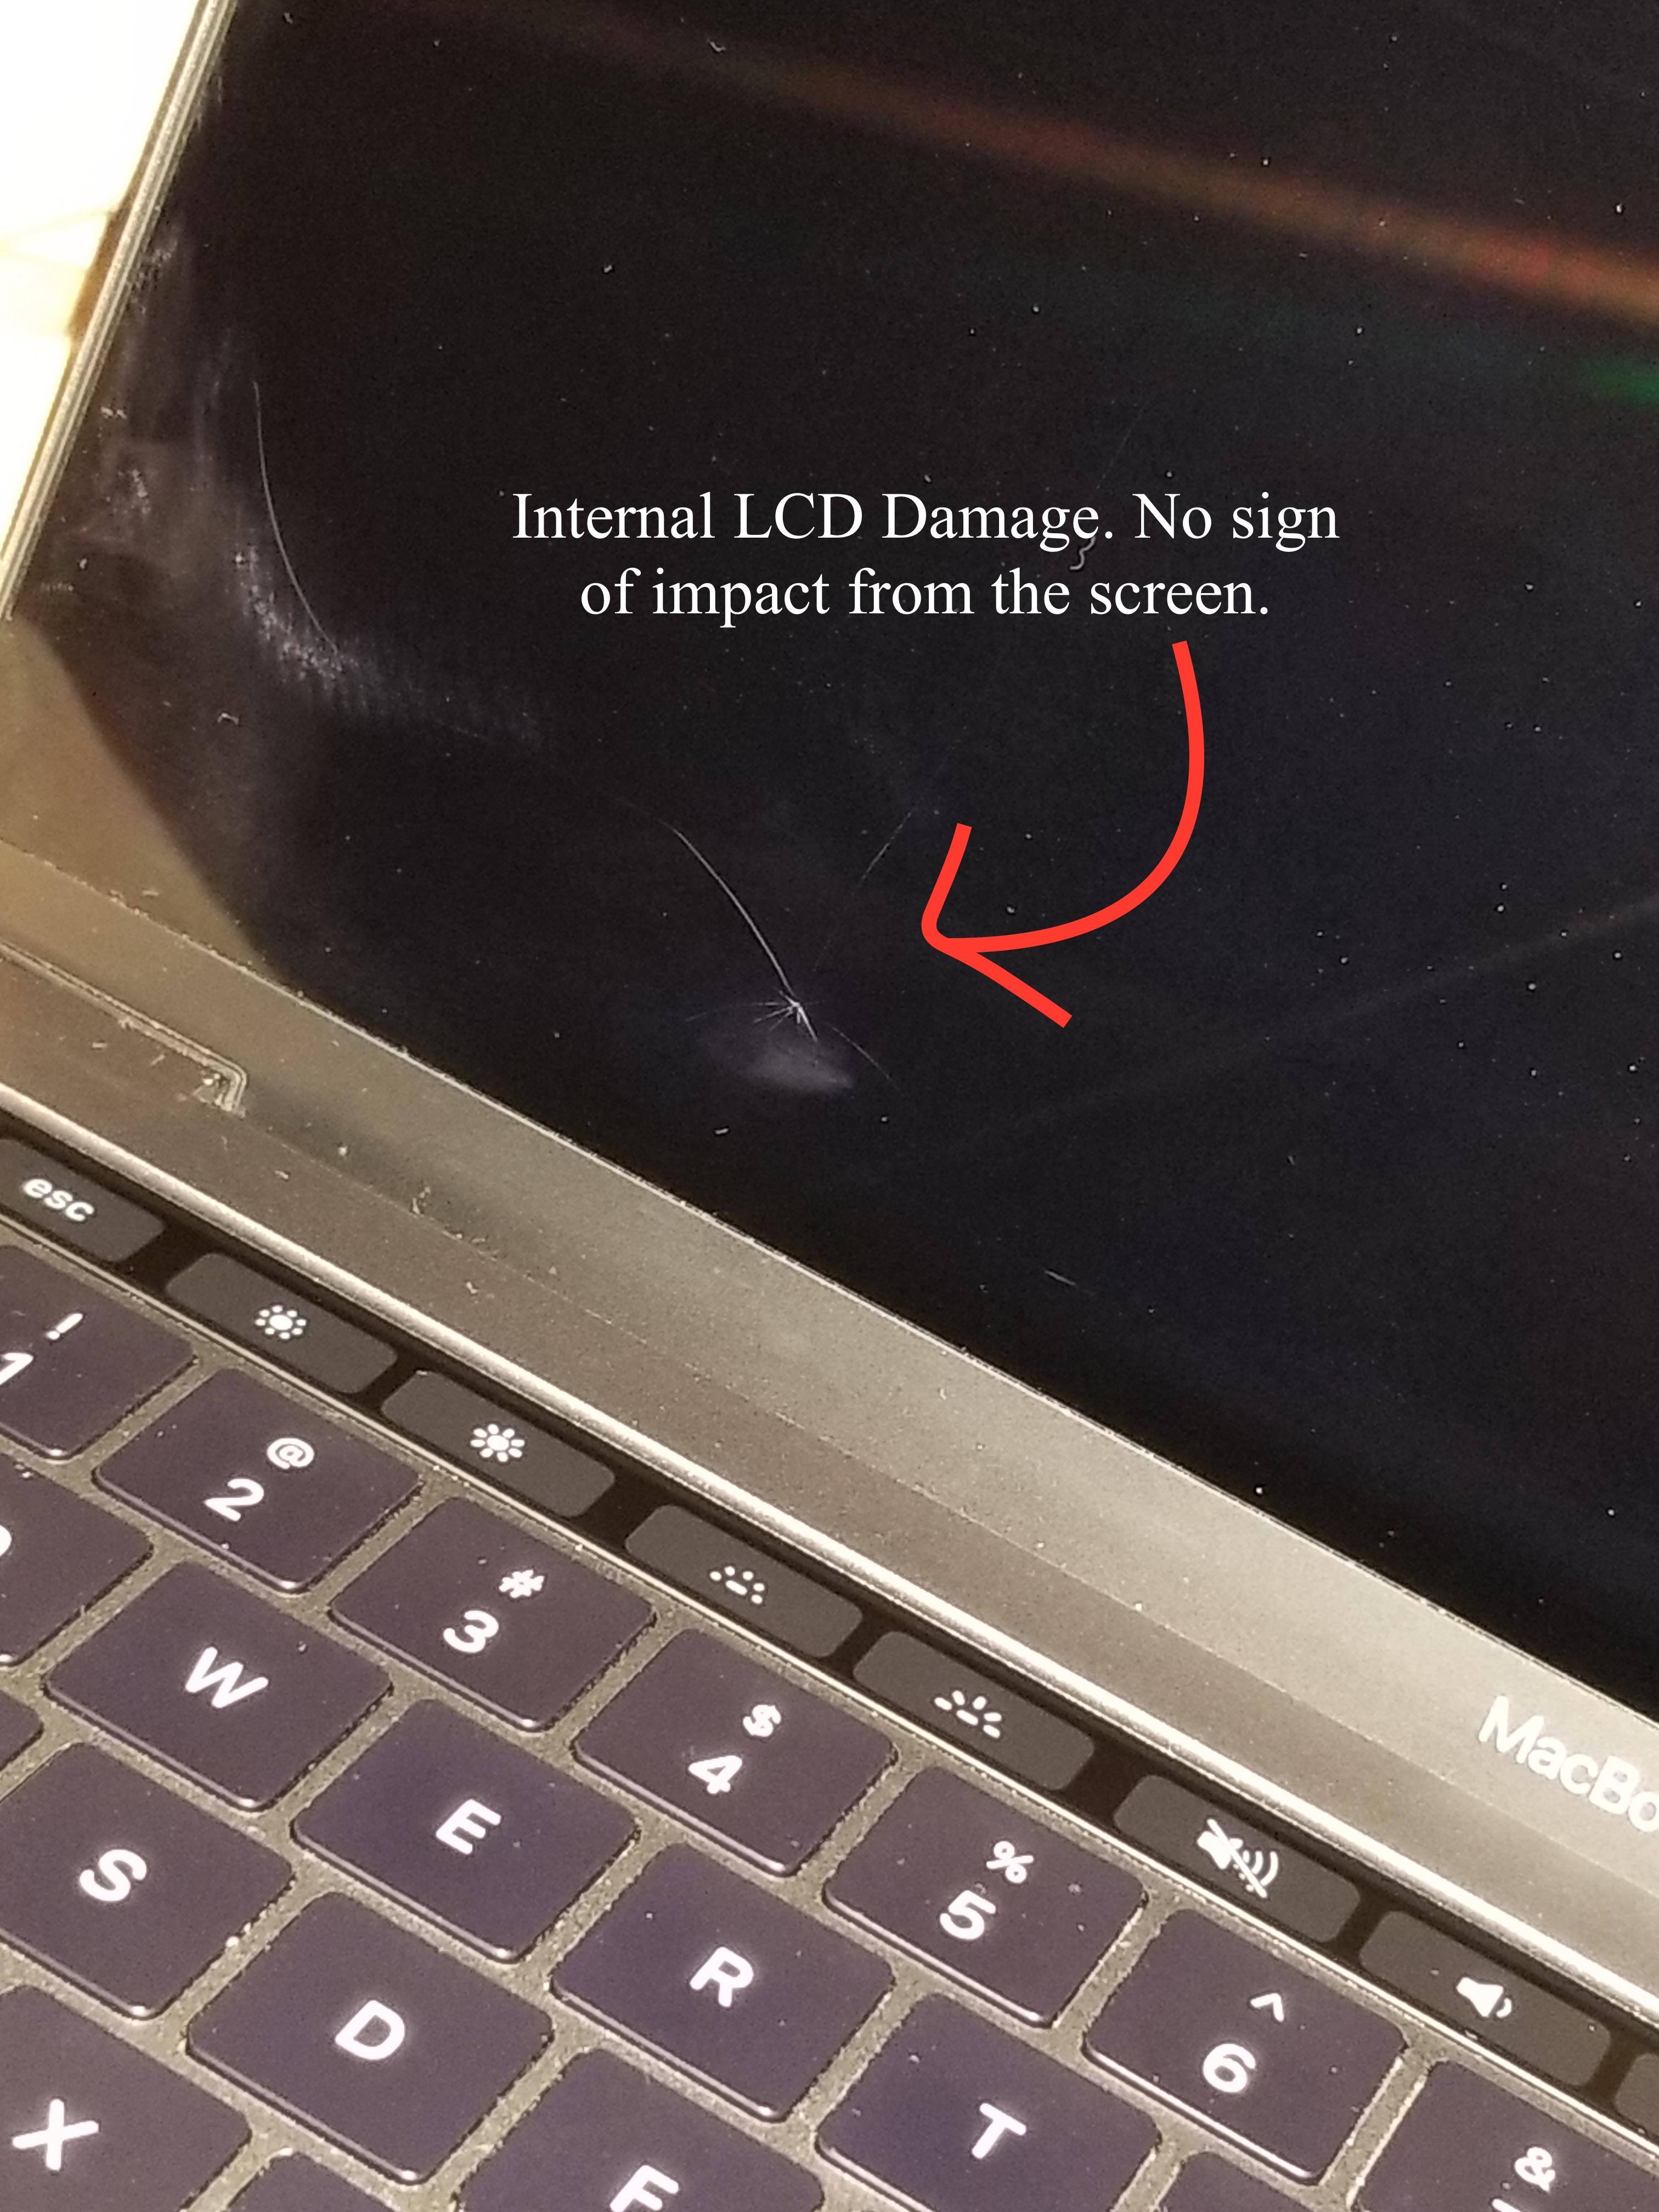 MacBook Pro LCD Broke (Not my fault) | MacRumors Forums